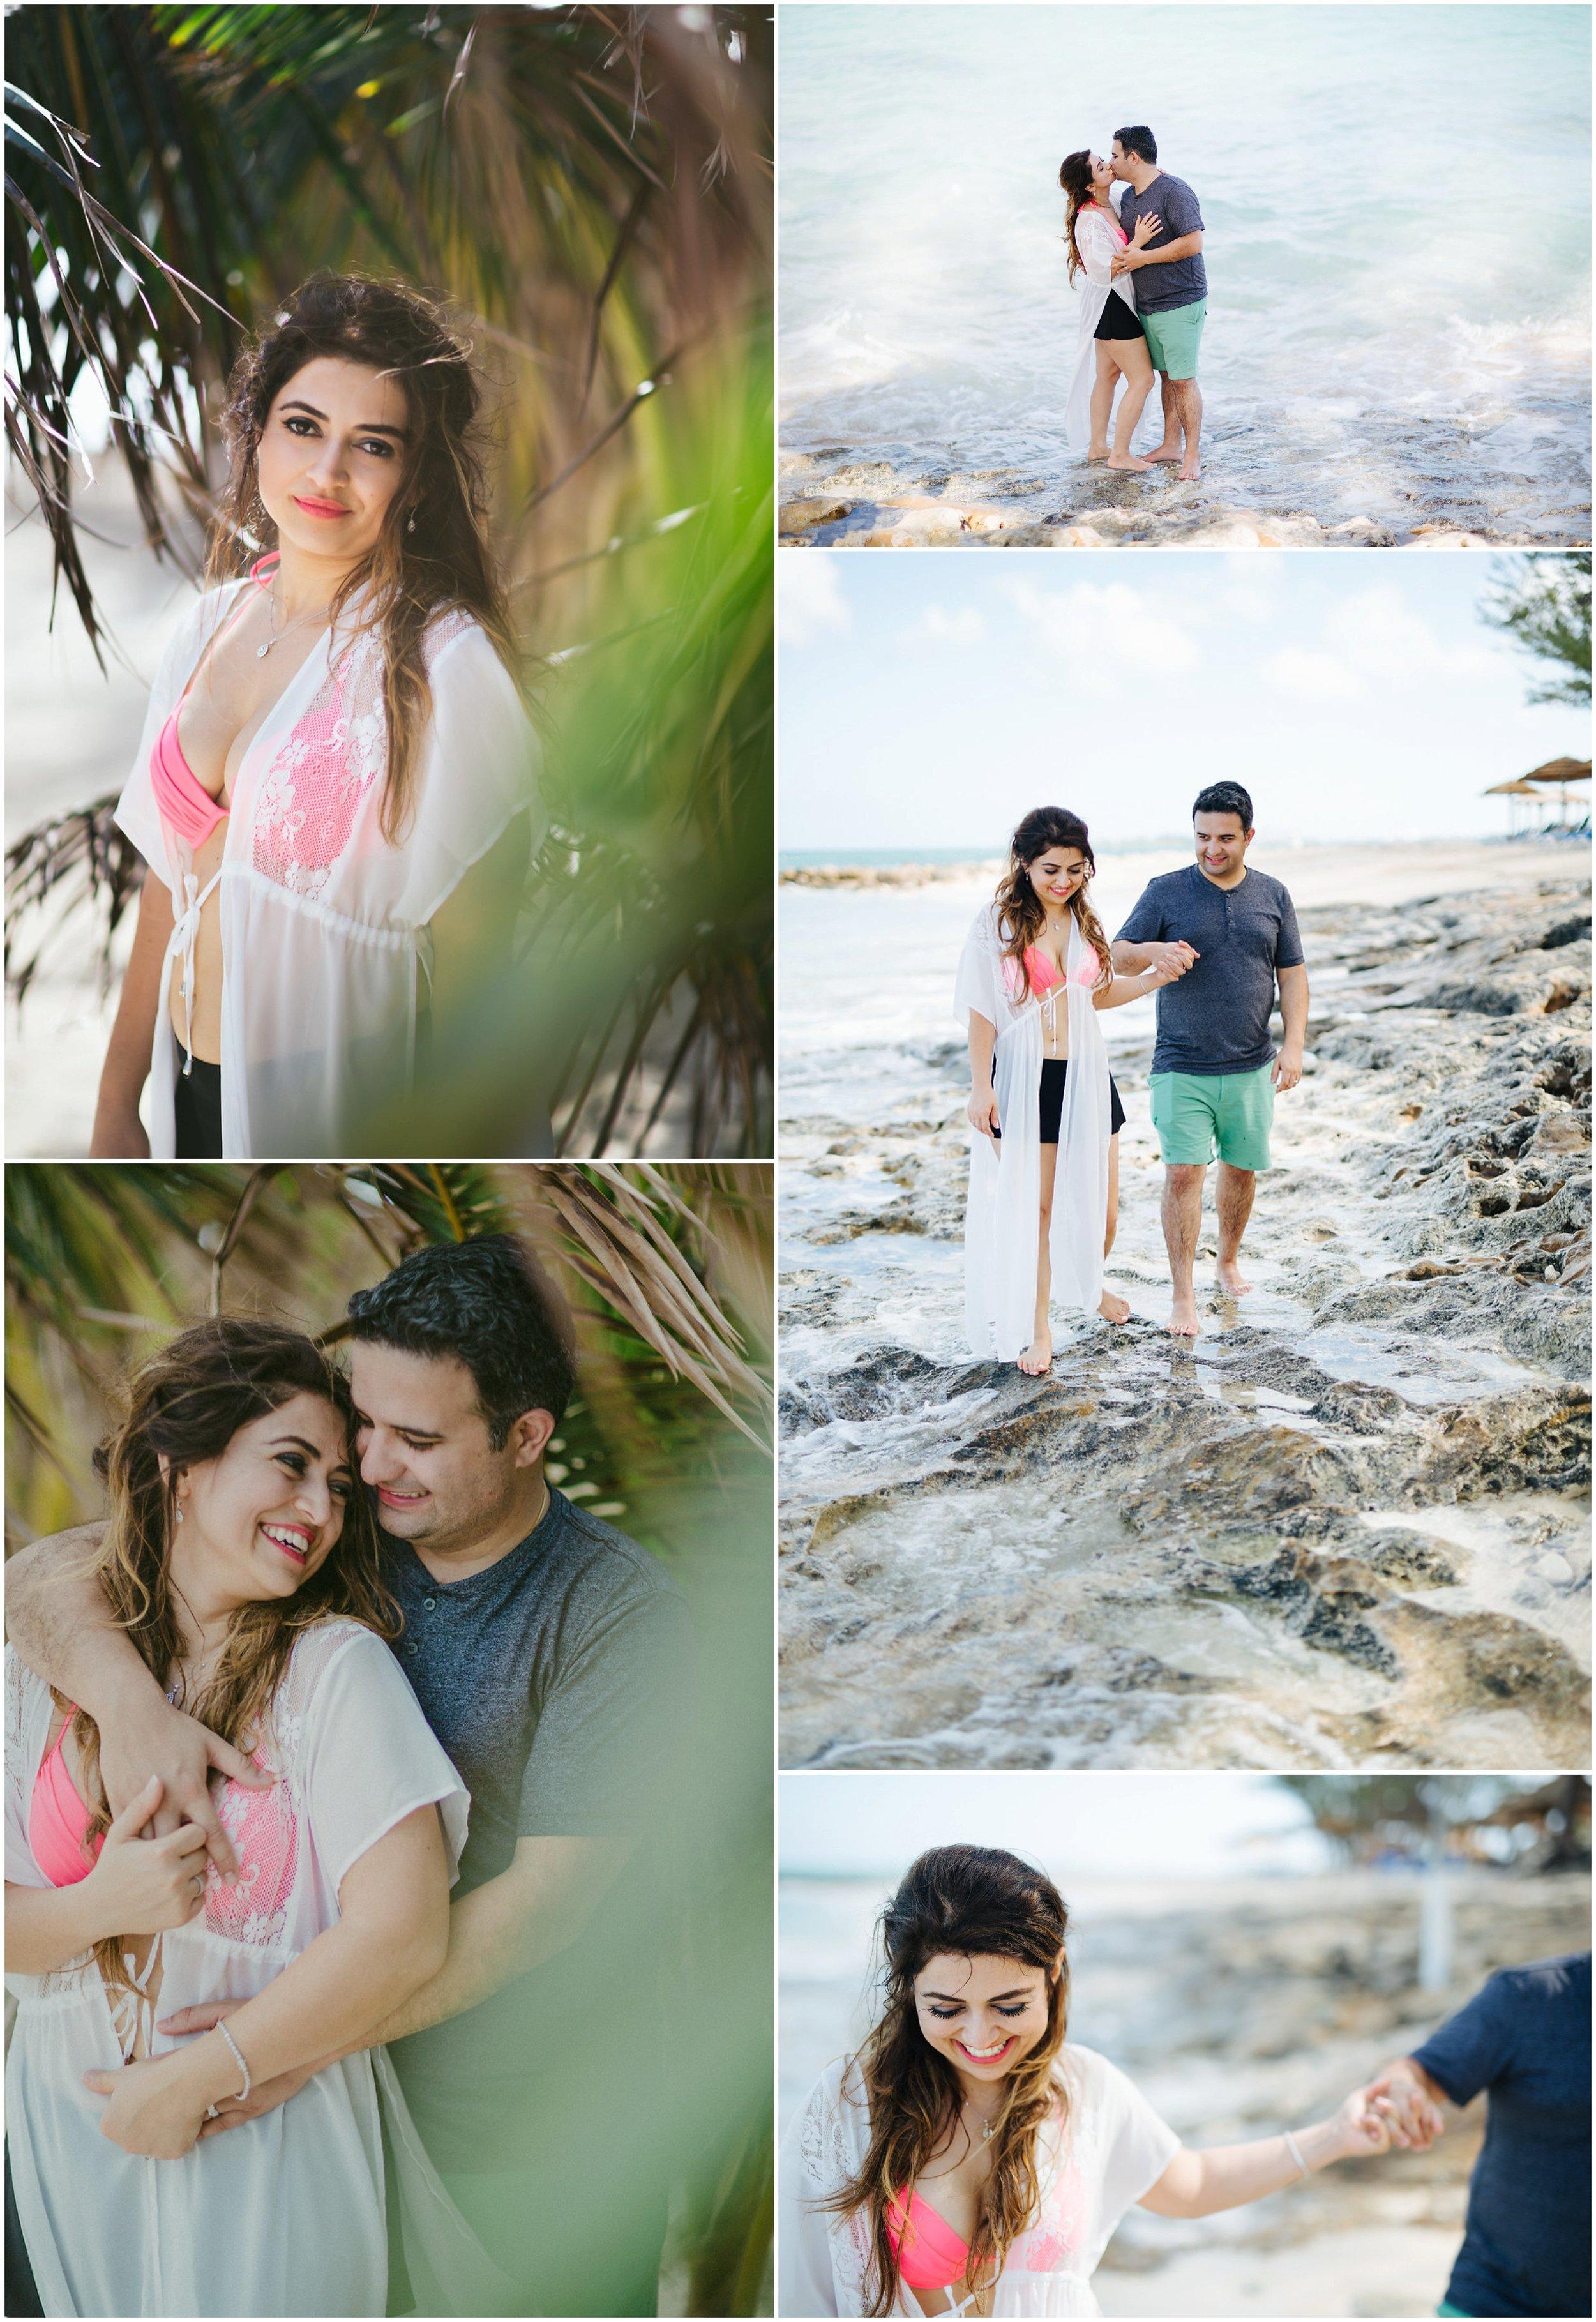 Le Cape Weddings- Destination Wedding Photography -ShayanandNikkie-790-X3_LuxuryDestinationPhotographer.jpg